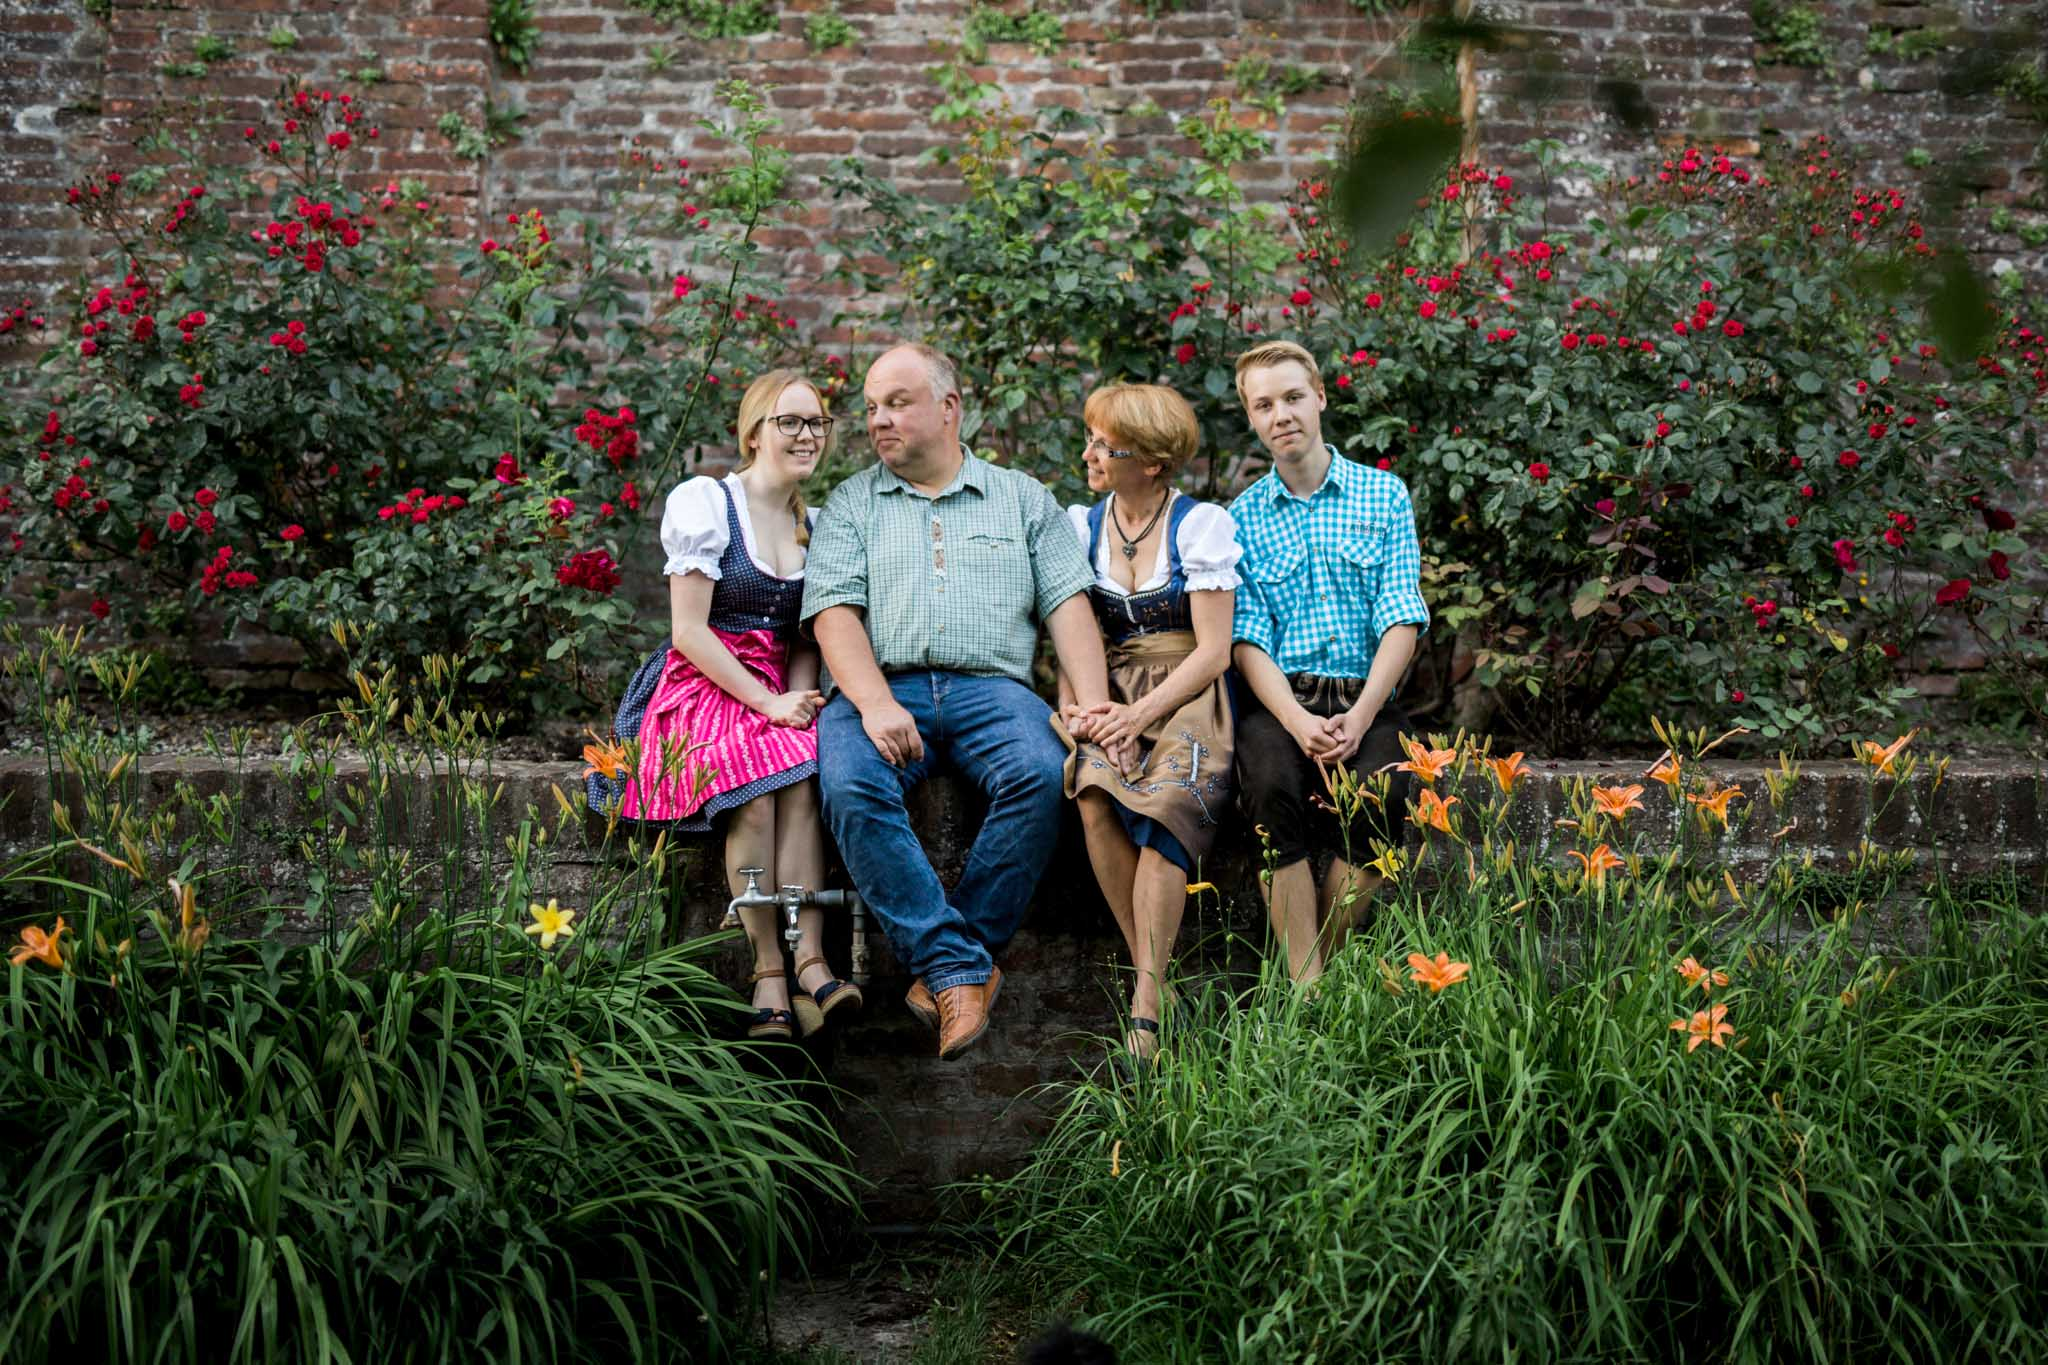 familie-familienbilder-familienfoto-shooting-fotograf-jork-stade-harsefeld-buxtehude-hamburg-www.smahs.de-sönke-mahs-1.jpg